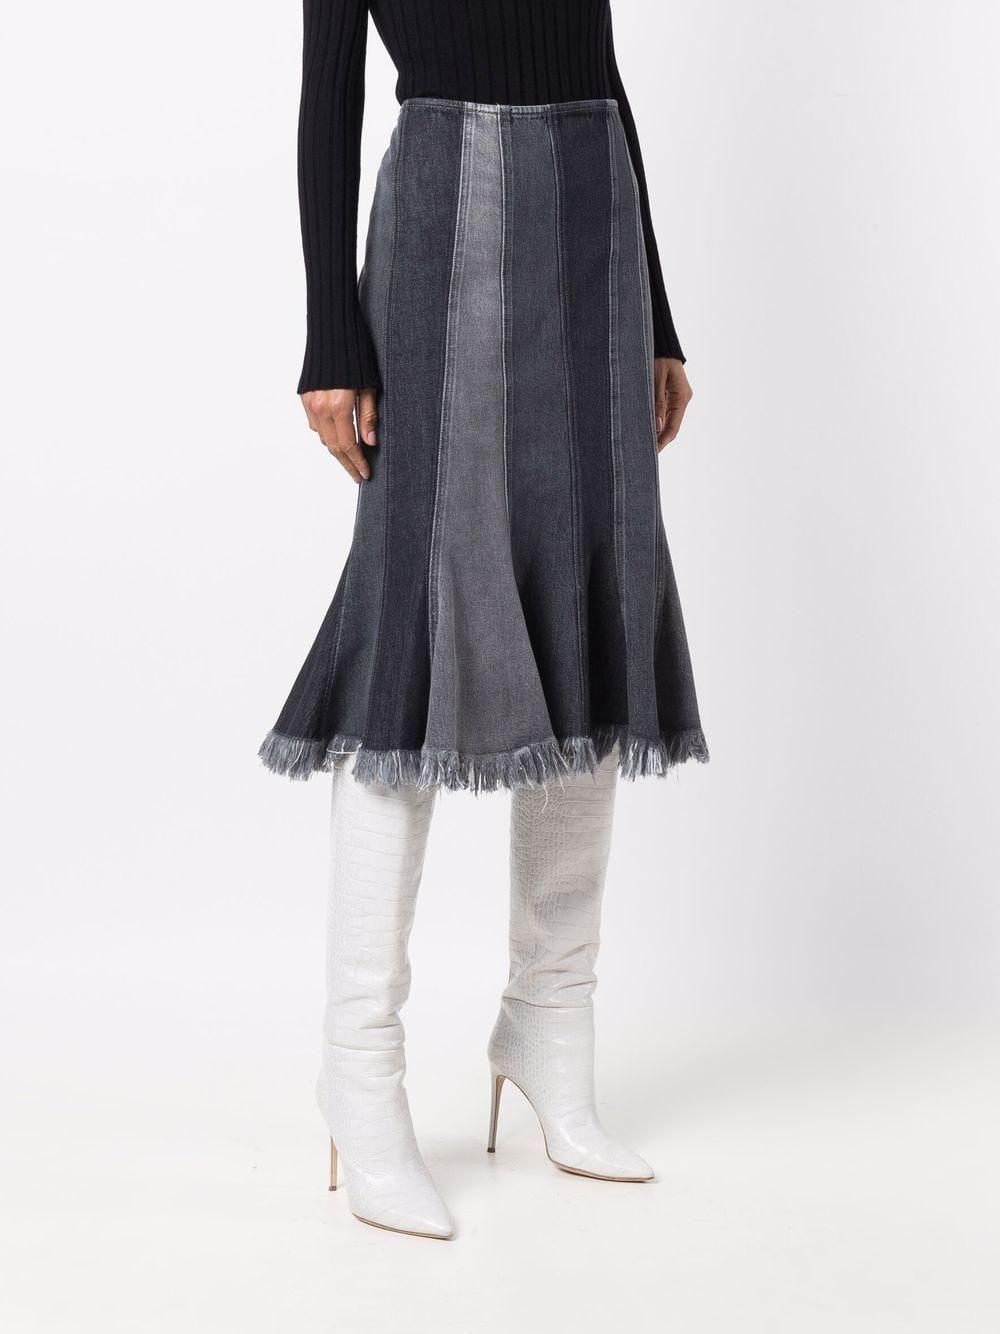 SPORTMAX | Skirt | USA002